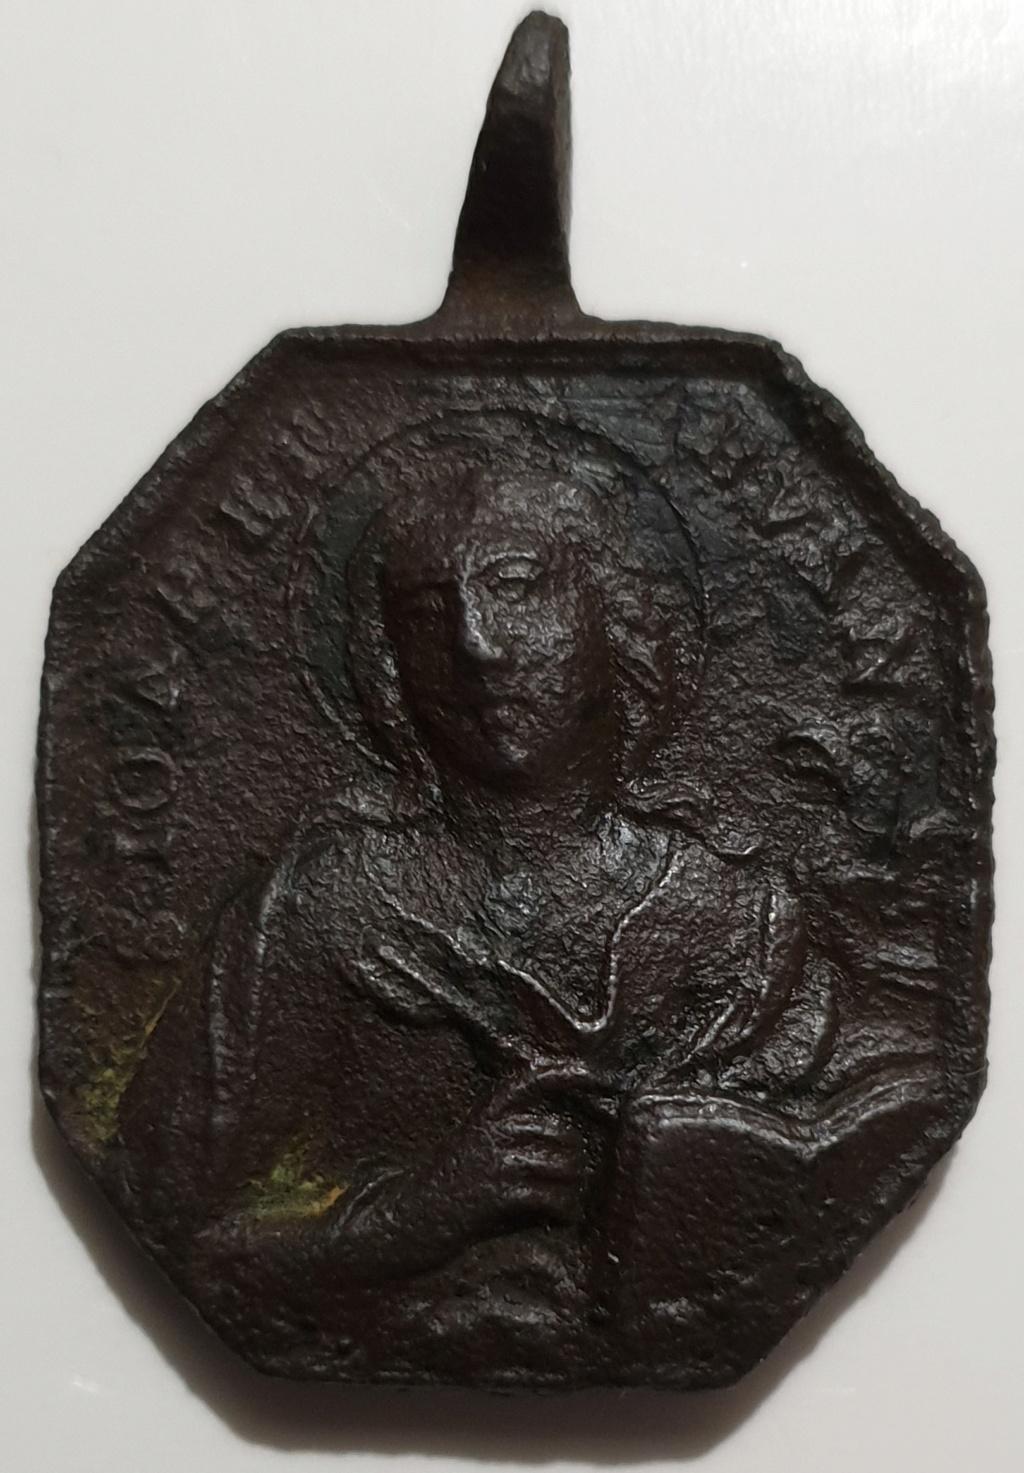 San Mateo Apóstol - San Juan Evangelista Apóstol, S. XVIII Img810